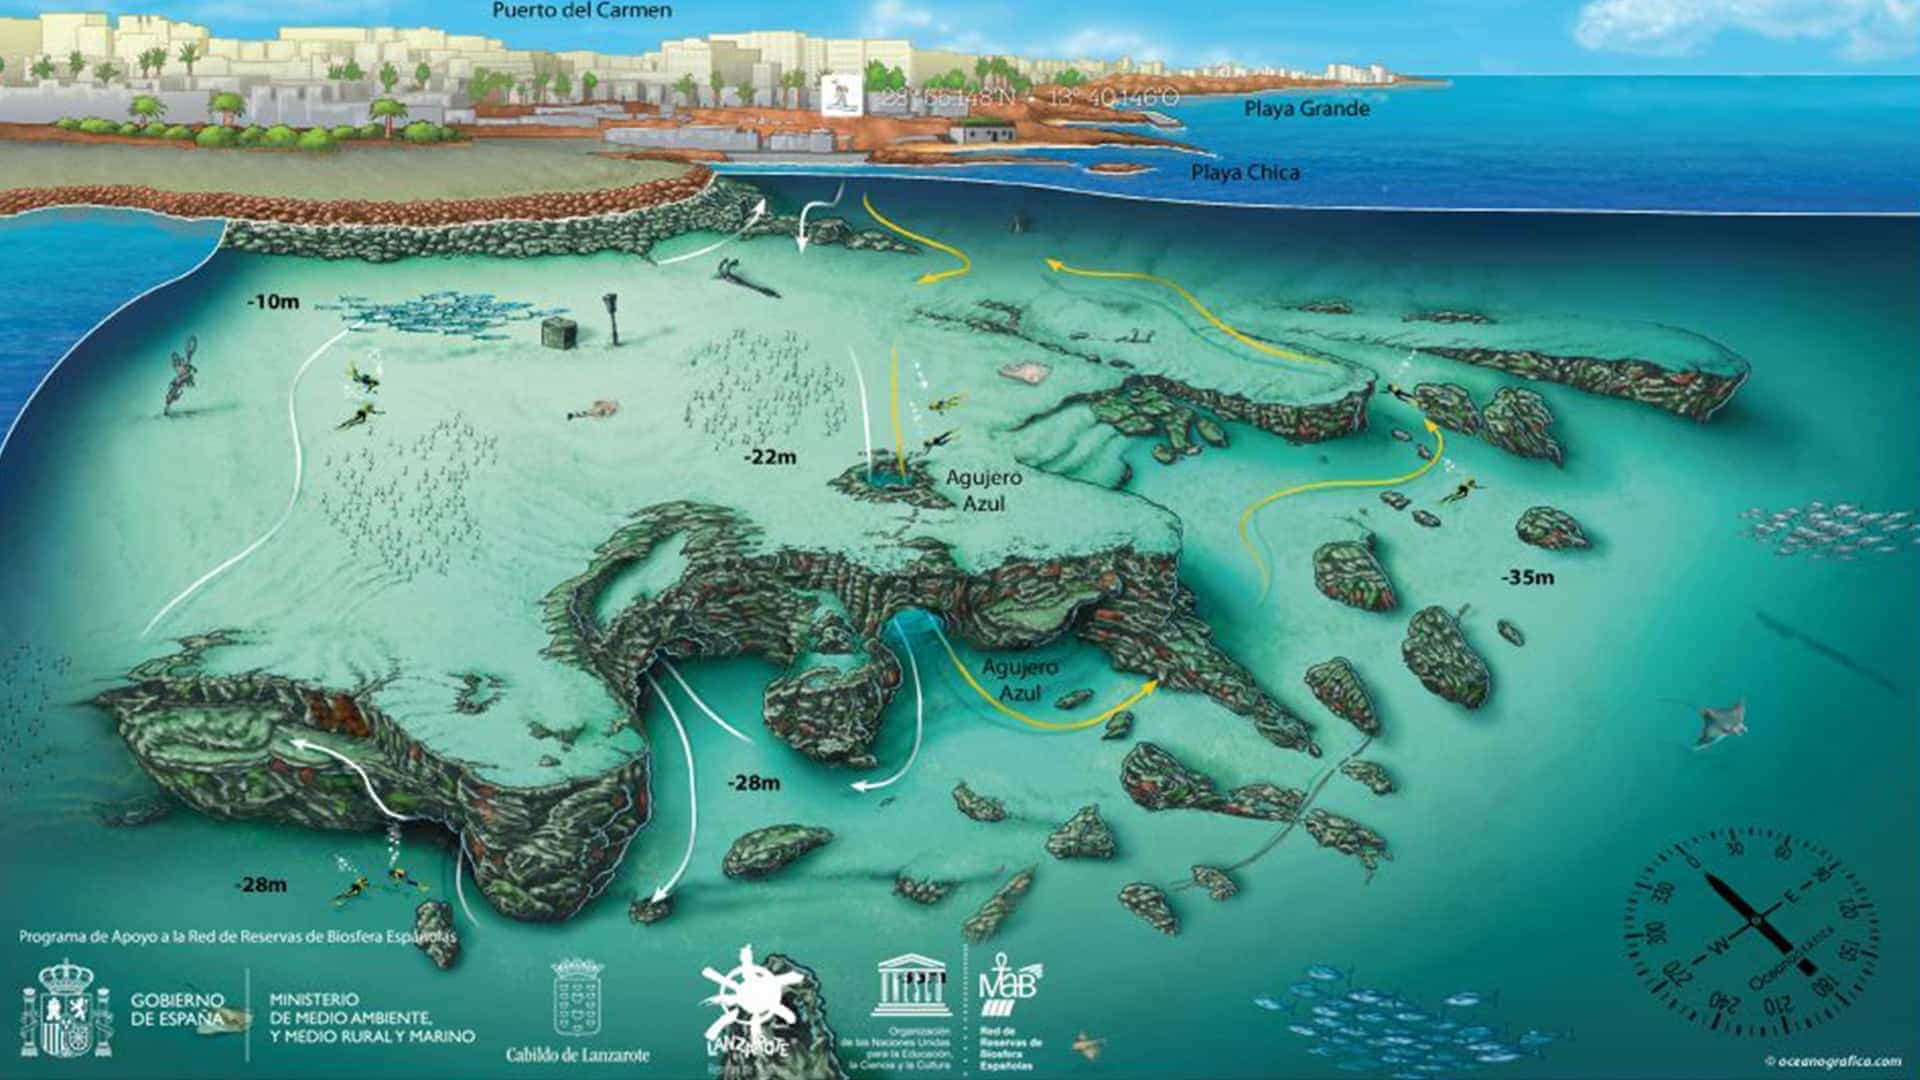 mojo dive ocean divers agujero azul dive centre lanzarote